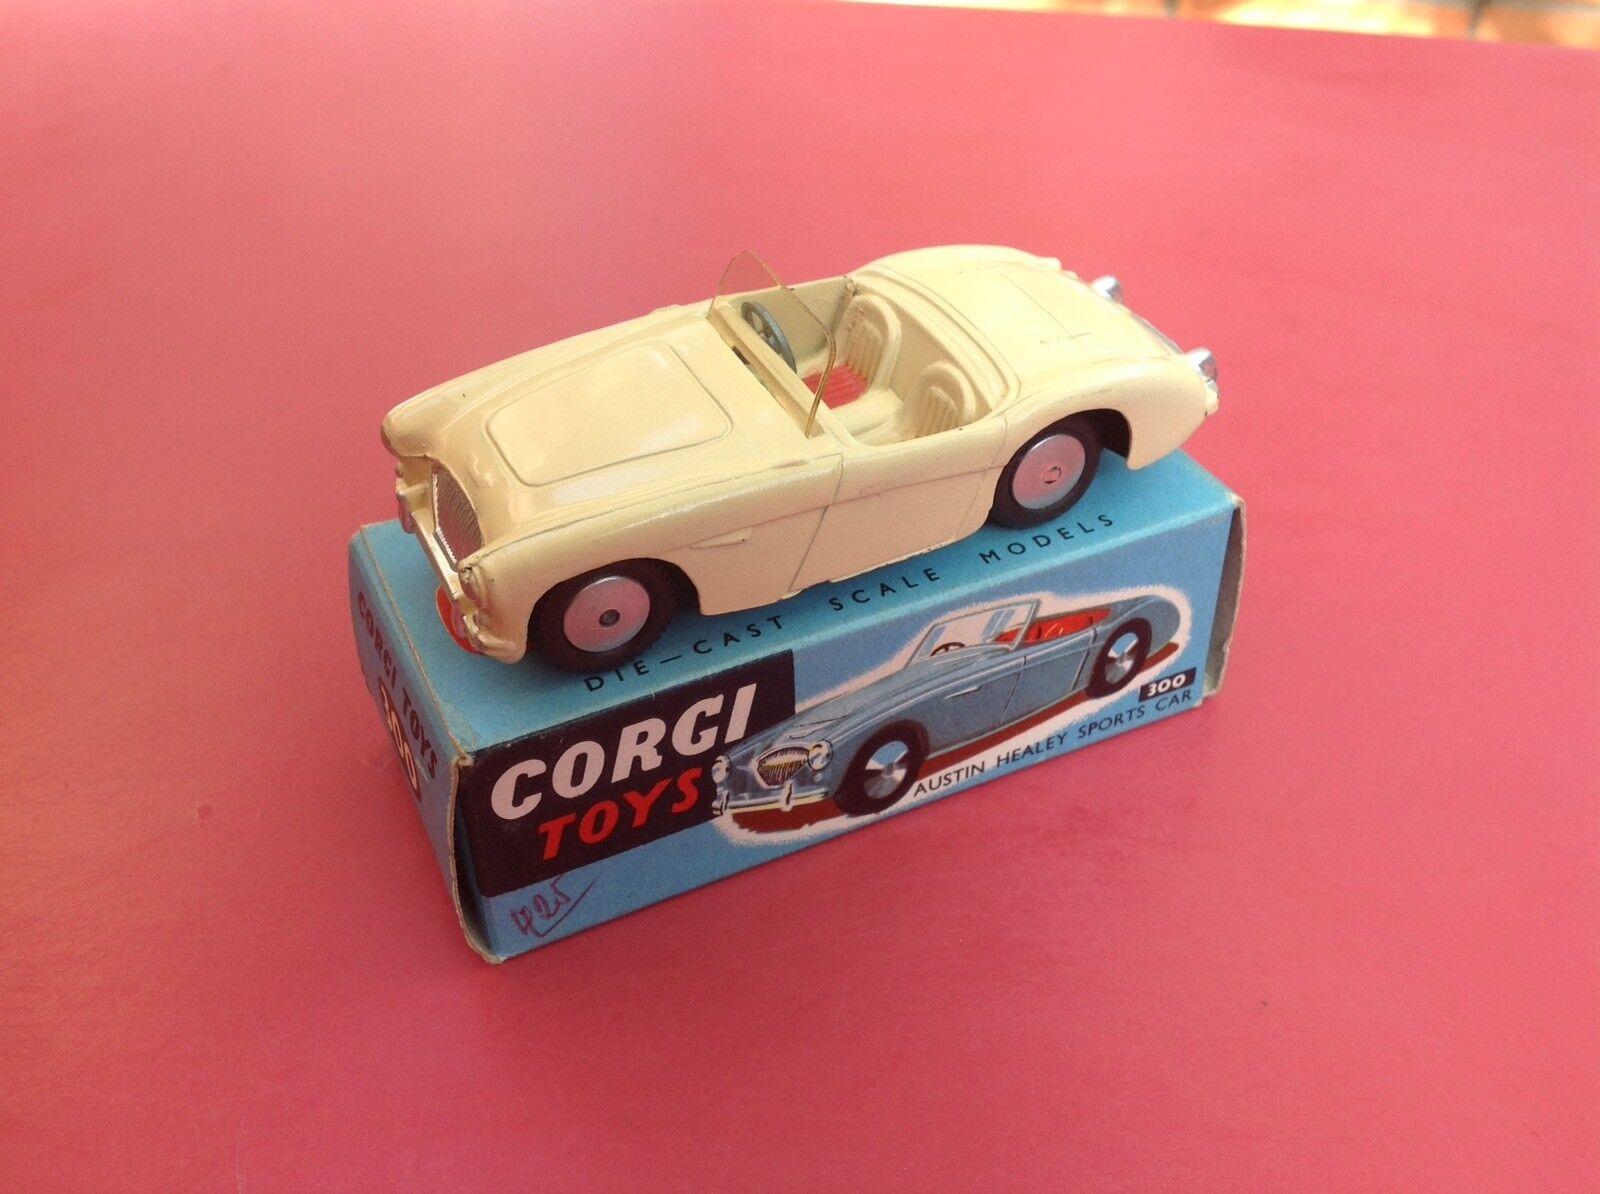 Corgi Corgi Corgi Toys REF 300 Austin Healey near Mint in original box 452a86